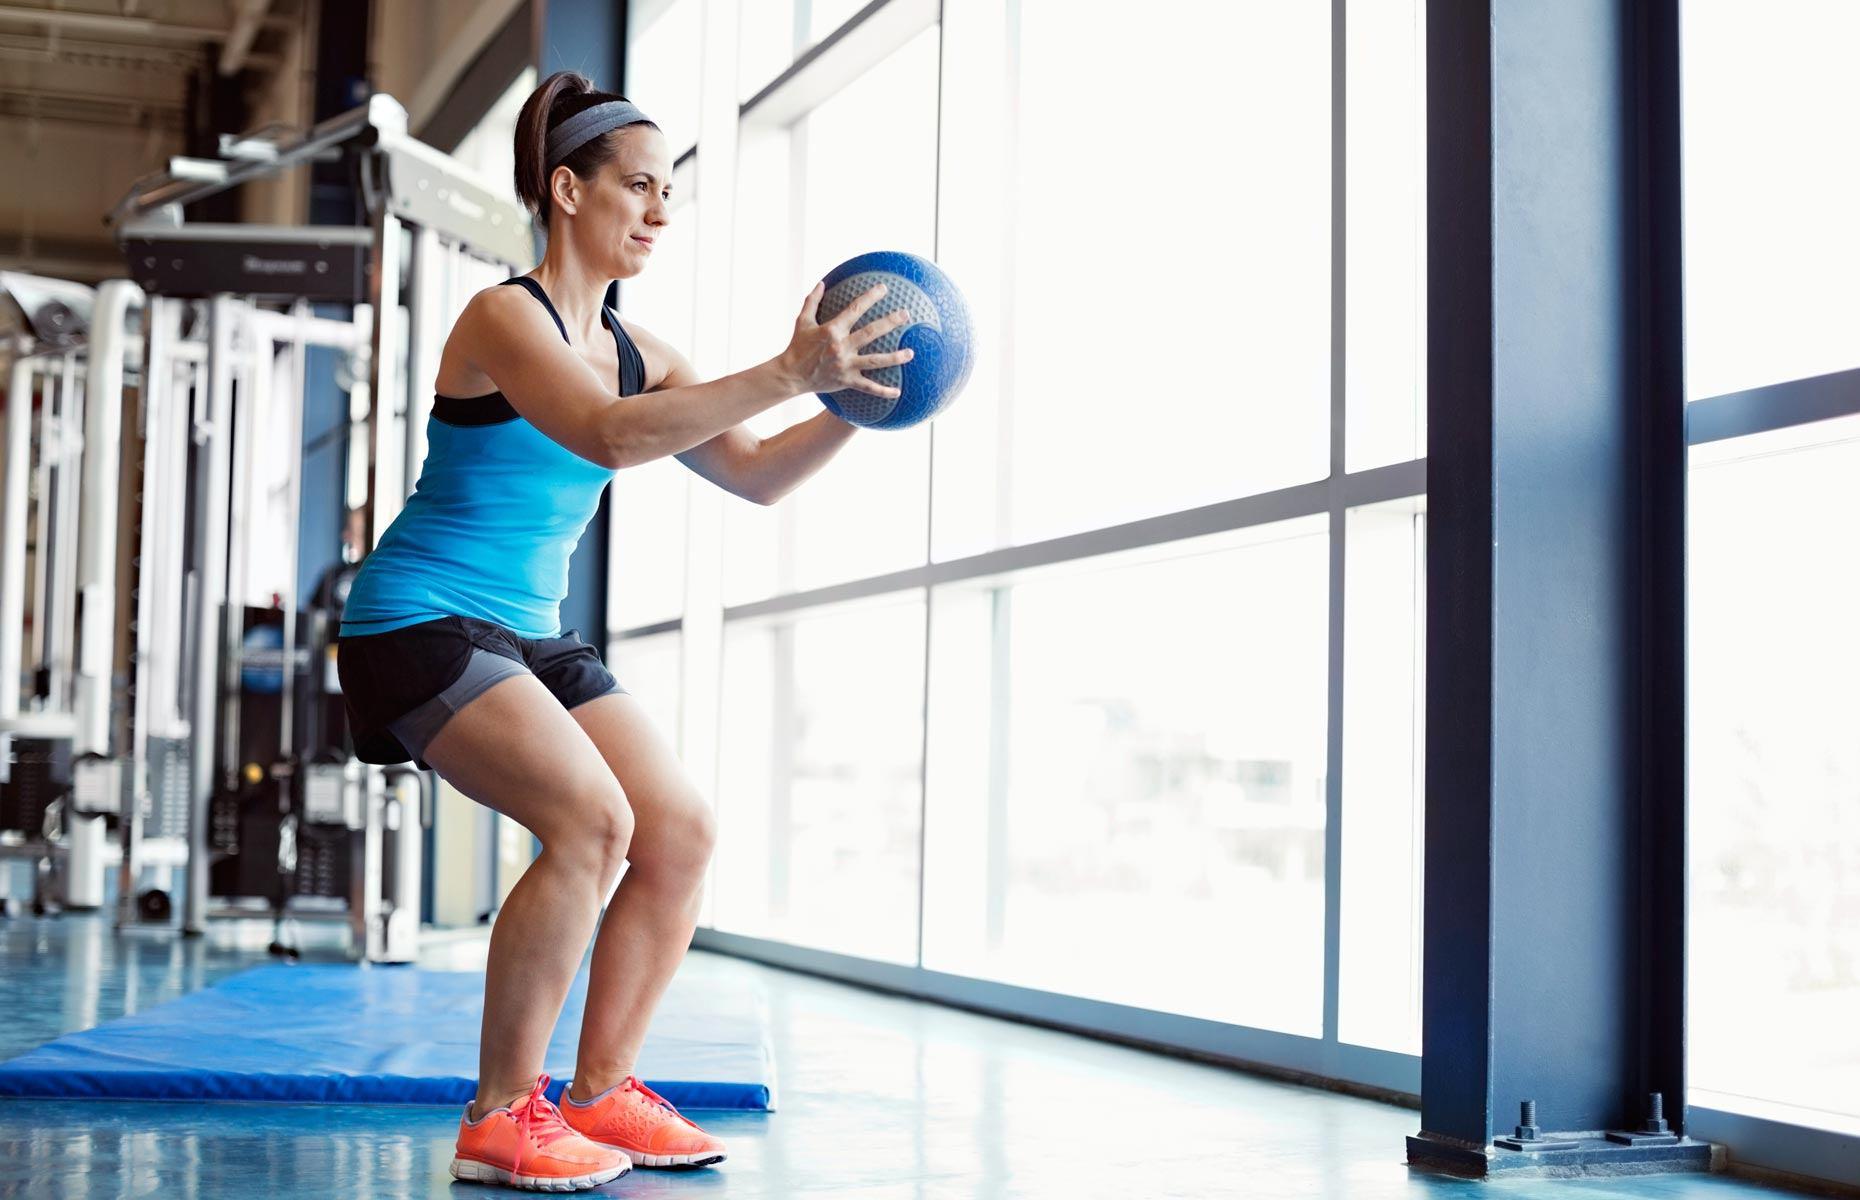 Super Power Strength : Build Strength - MSN Health & Fitness